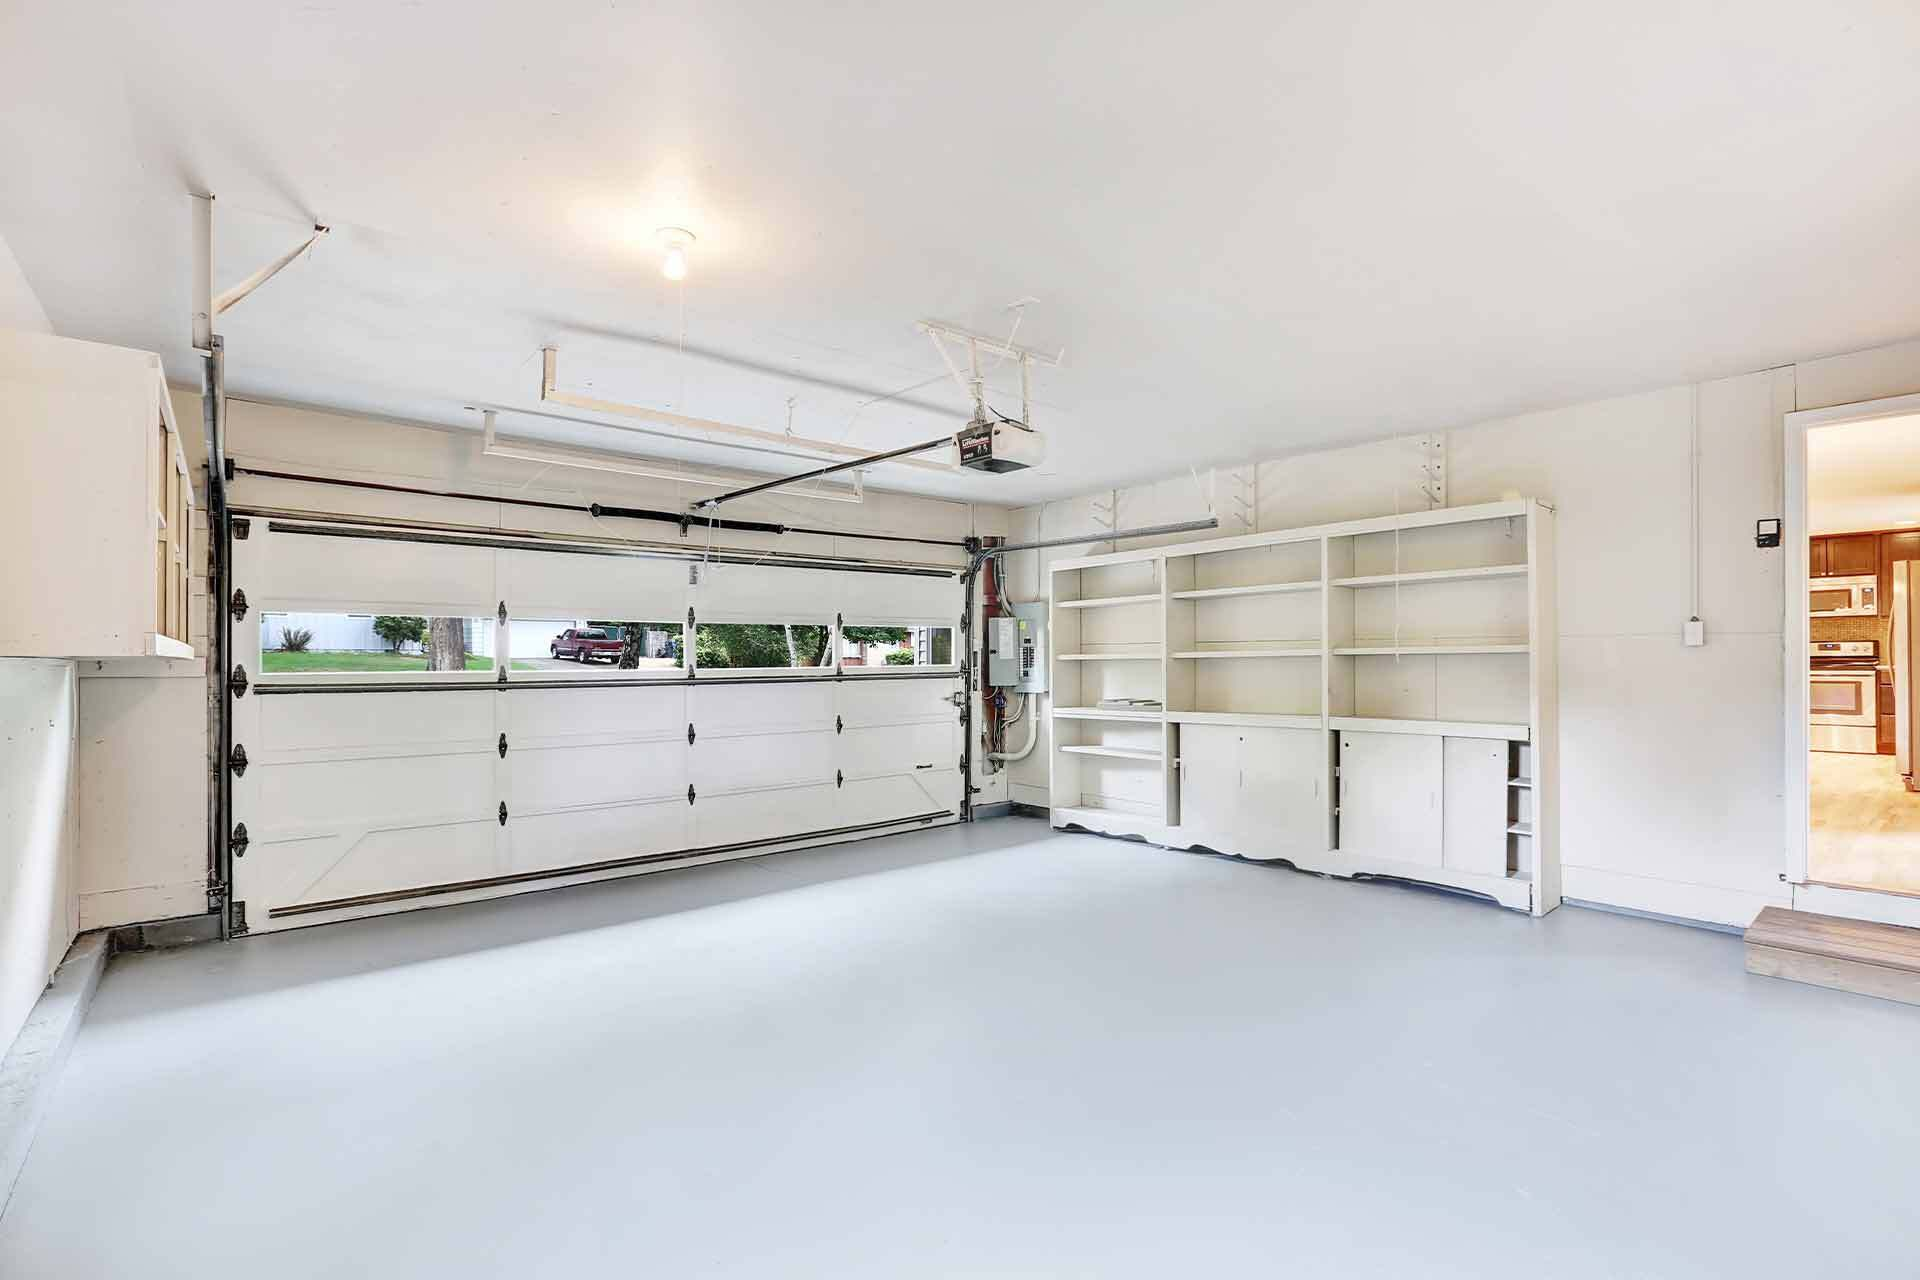 Garage conversion cost